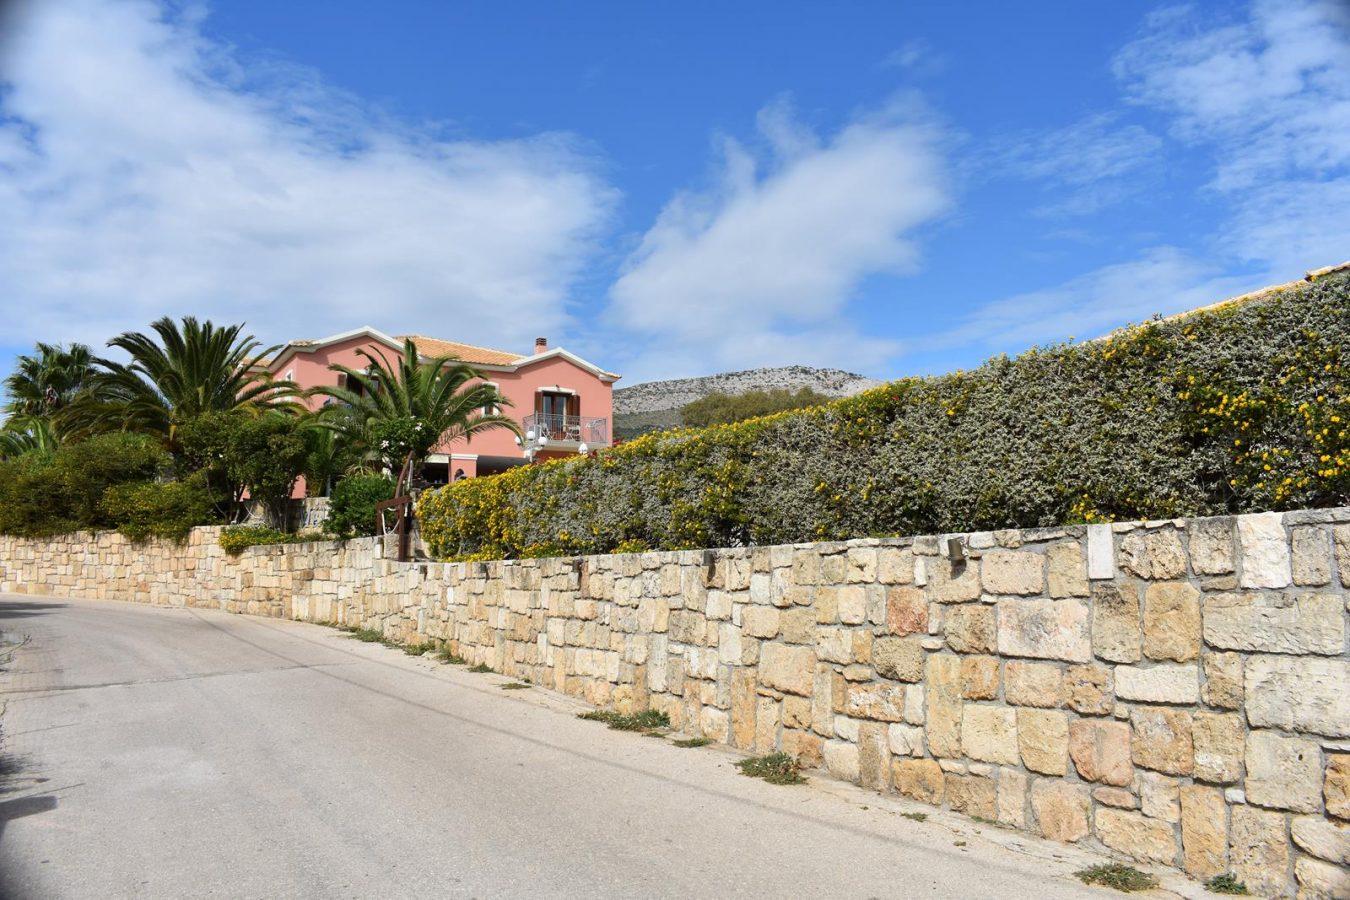 Exterior Road in Skala Kefalonia - Melidron Hotel Kefalonia